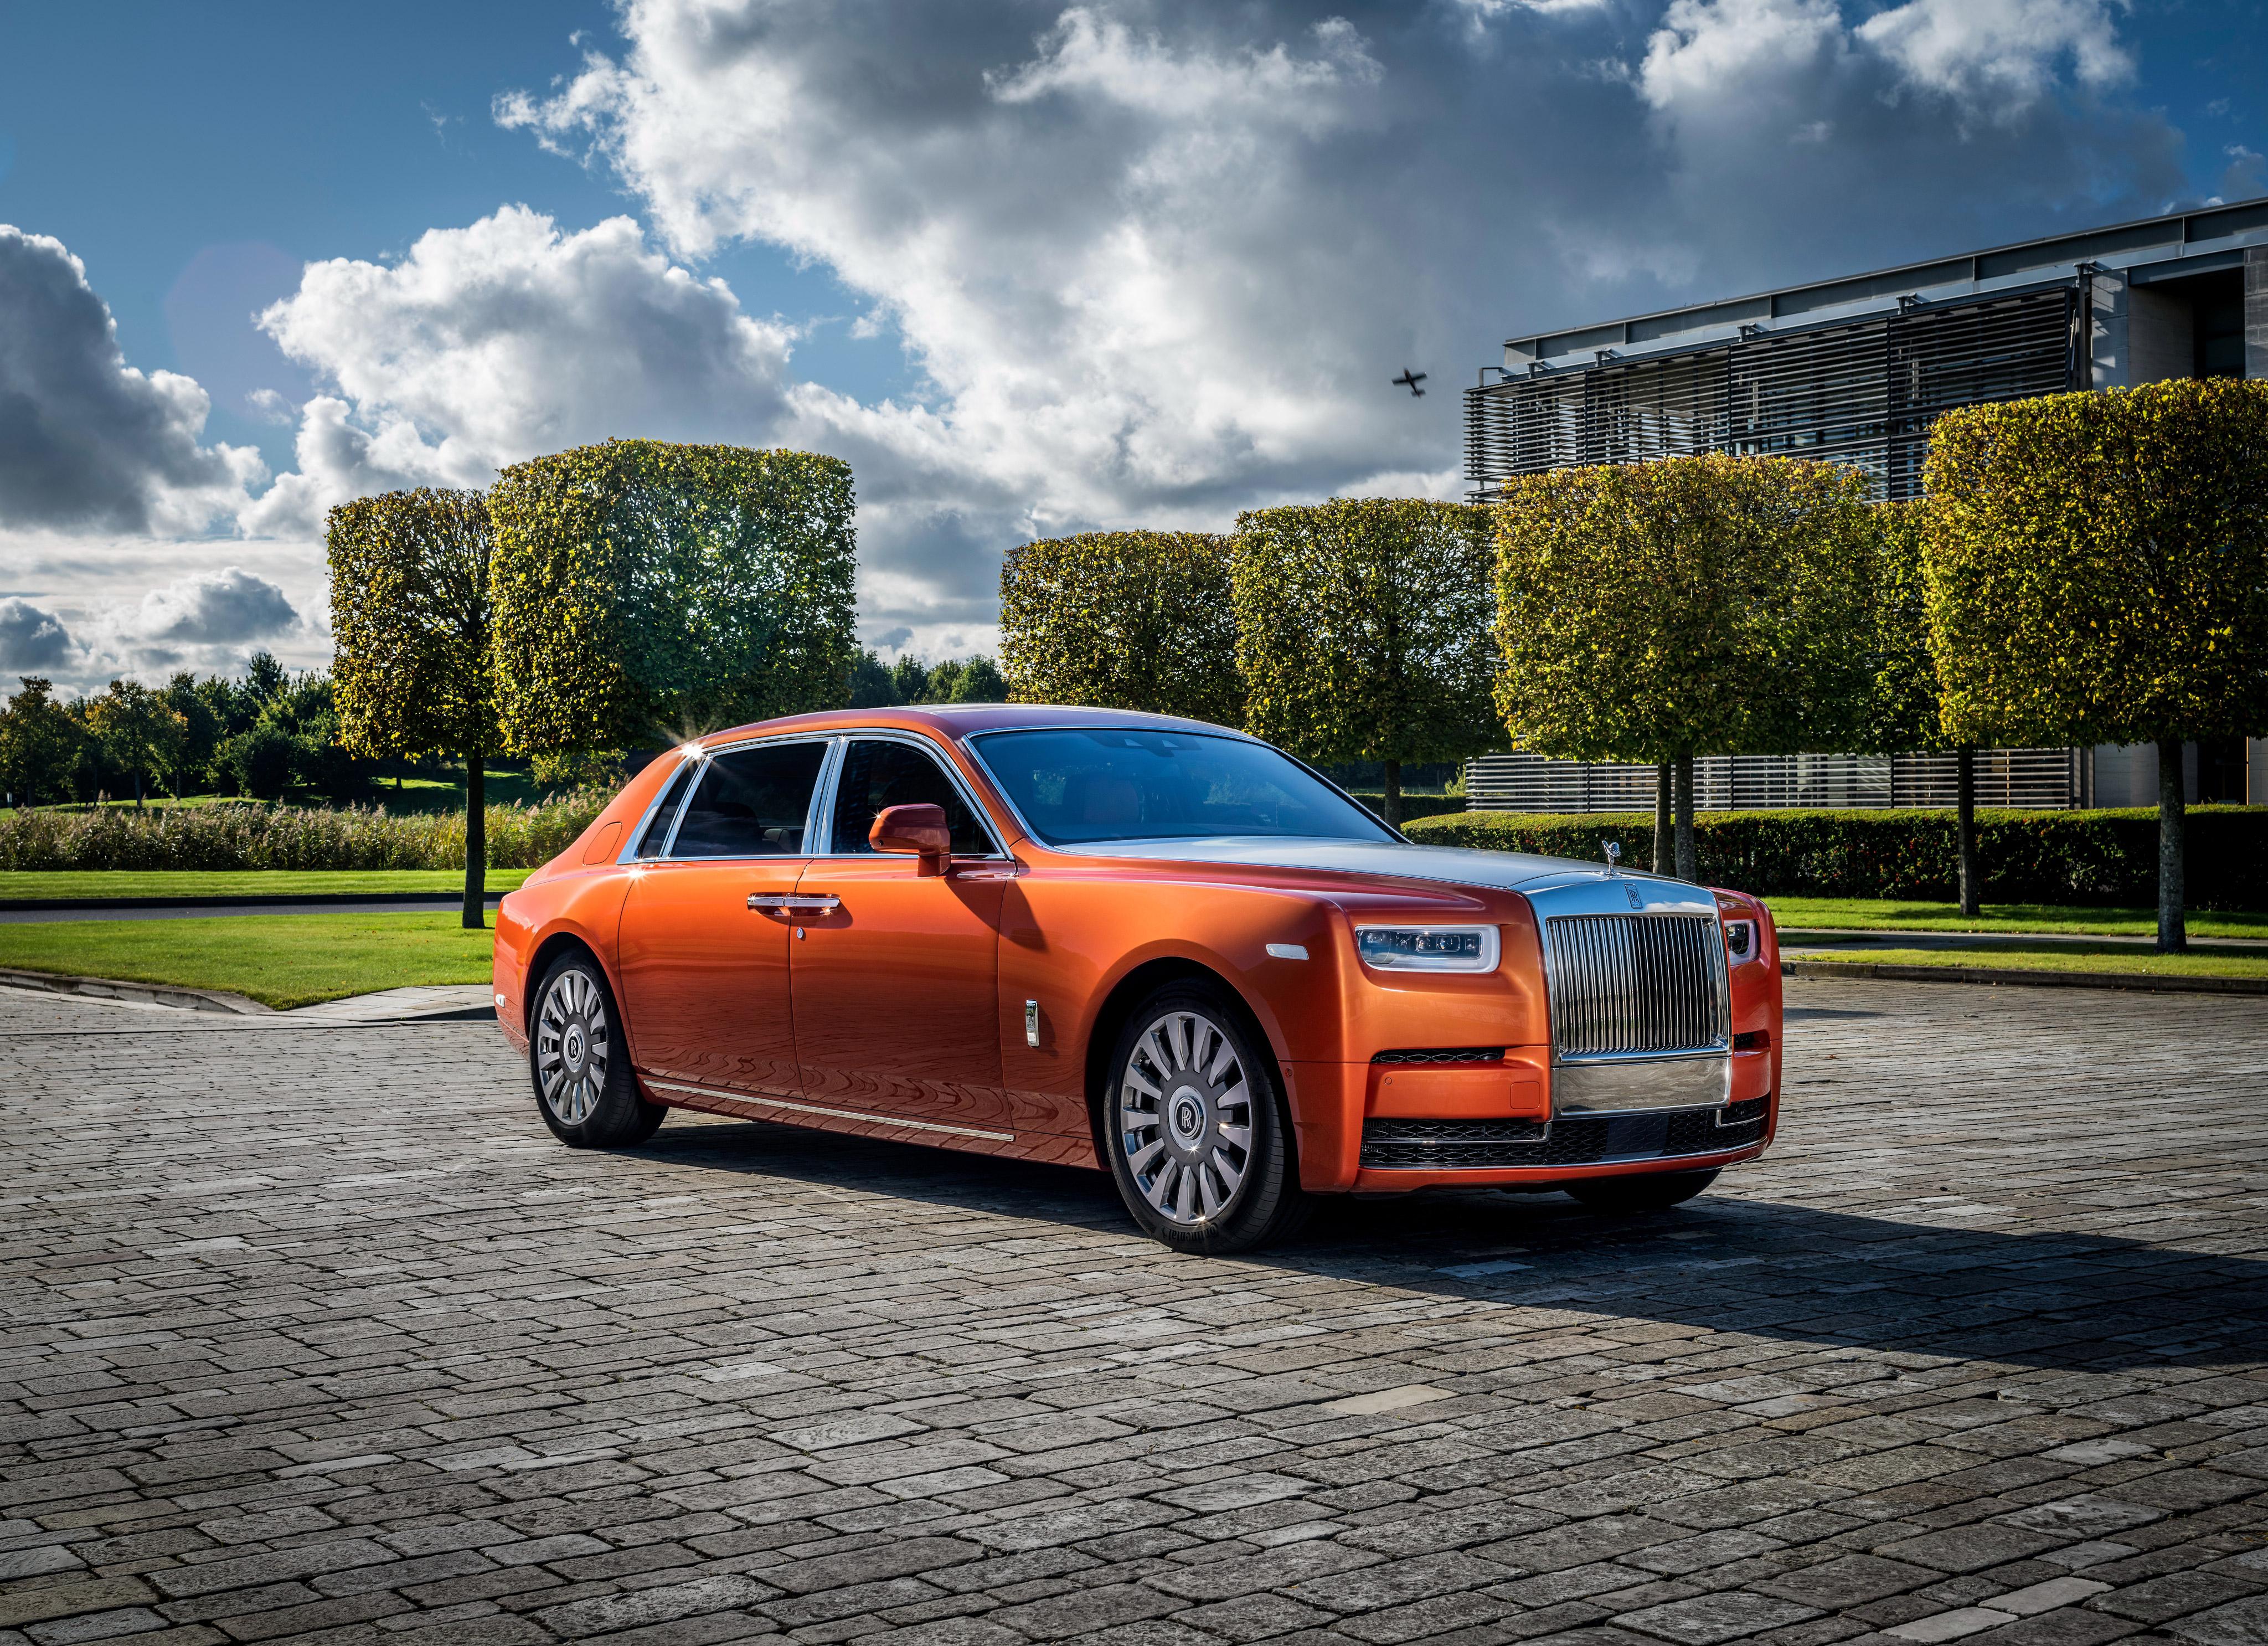 Rolls Royce Phantom EWB 4k, HD Cars, 4k Wallpapers, Images ...